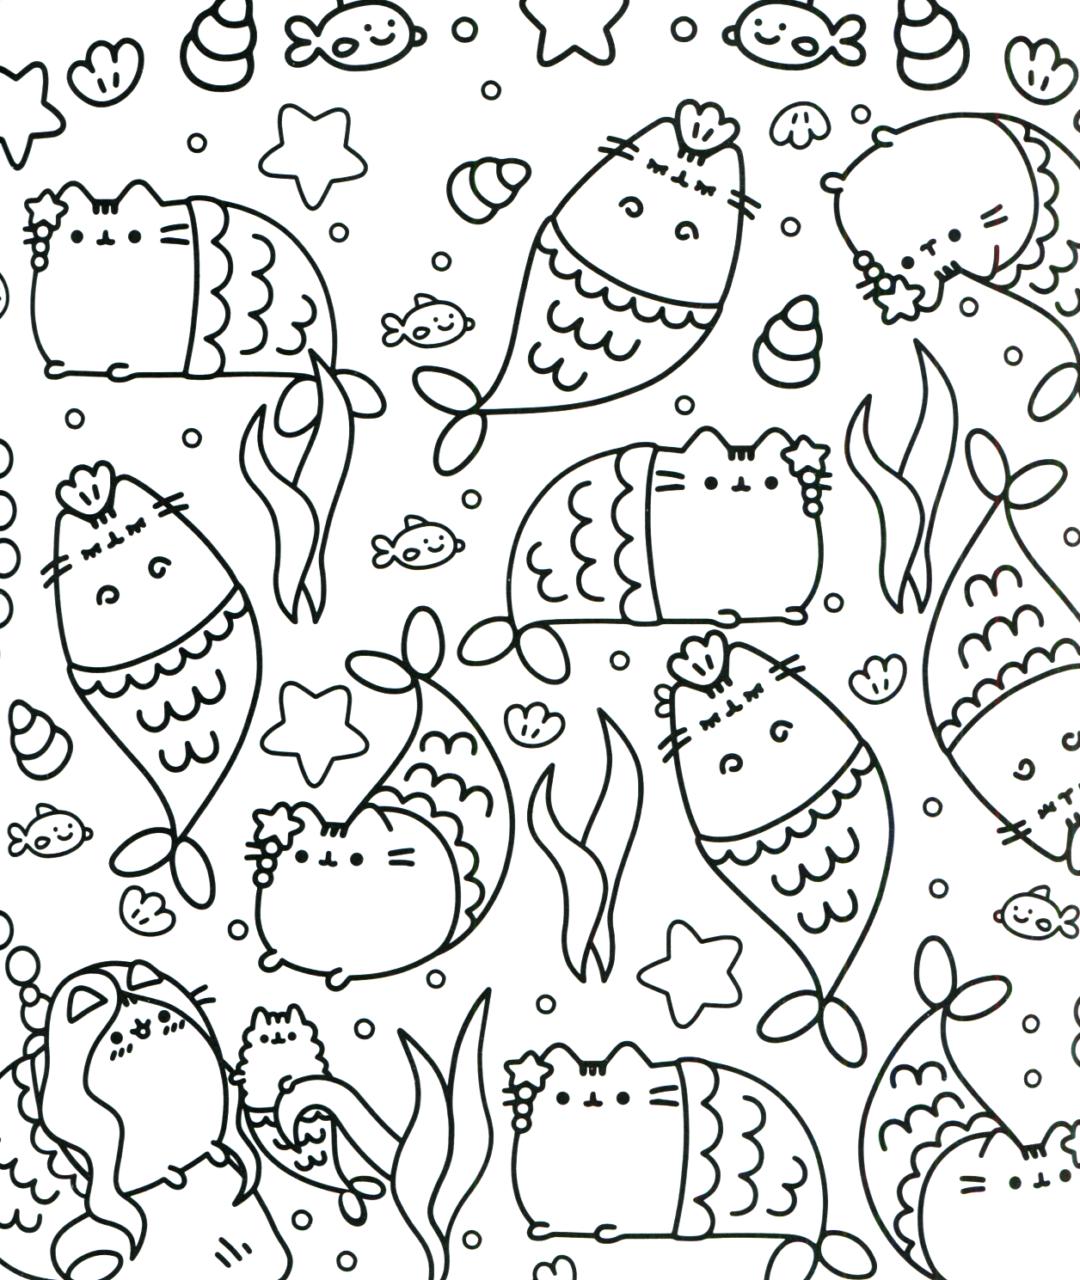 Coloring Rocks Pusheen Coloring Pages Mermaid Coloring Pages Unicorn Coloring Pages